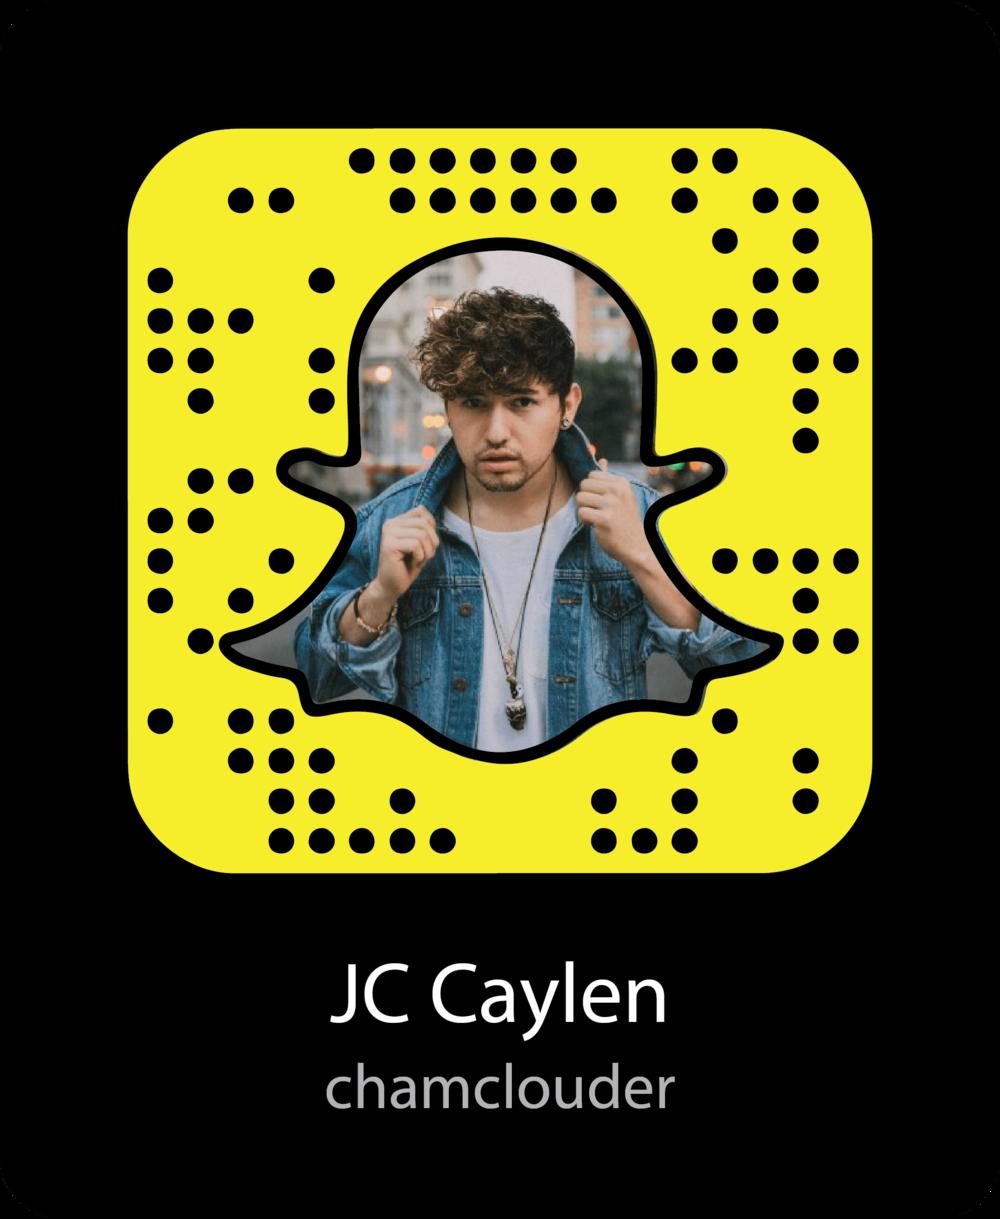 jc-caylen-celebrity-snapchat-snapcode